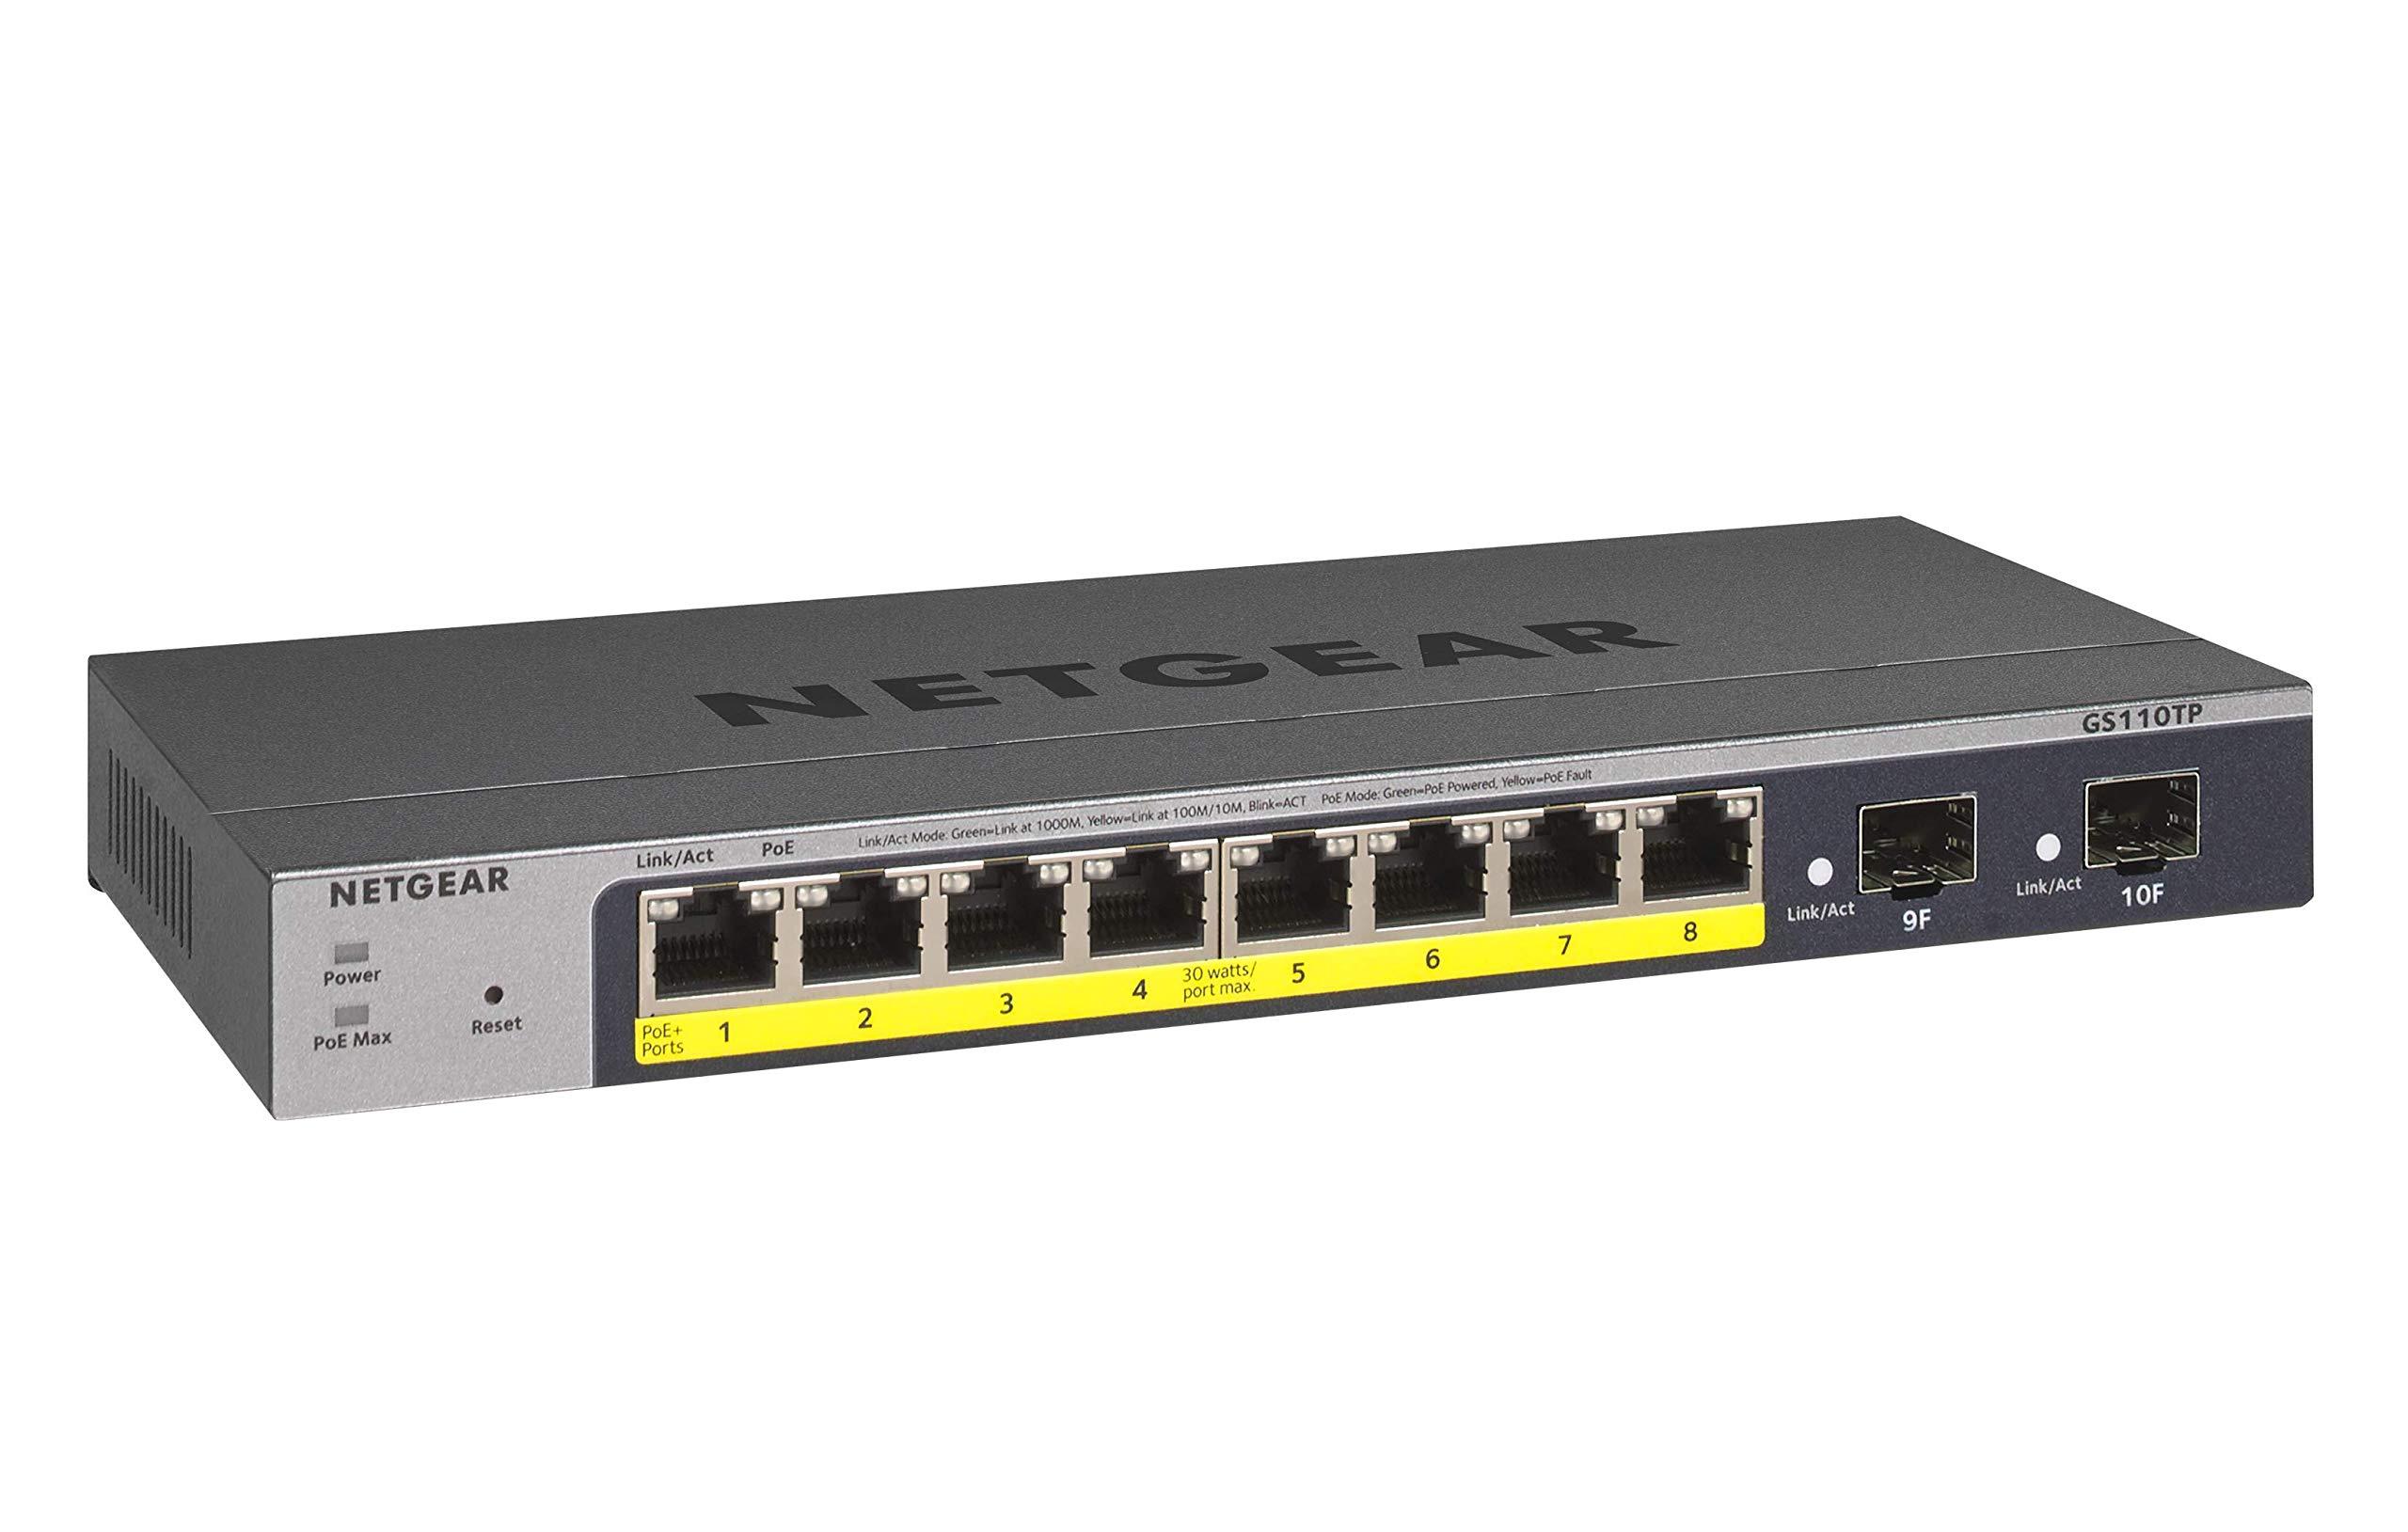 NETGEAR 8-Port Gigabit Ethernet Smart Managed Pro PoE Switch (GS110TP) - with 8 x PoE+ @ 55W, 2 x 1G SFP, Desktop by NETGEAR